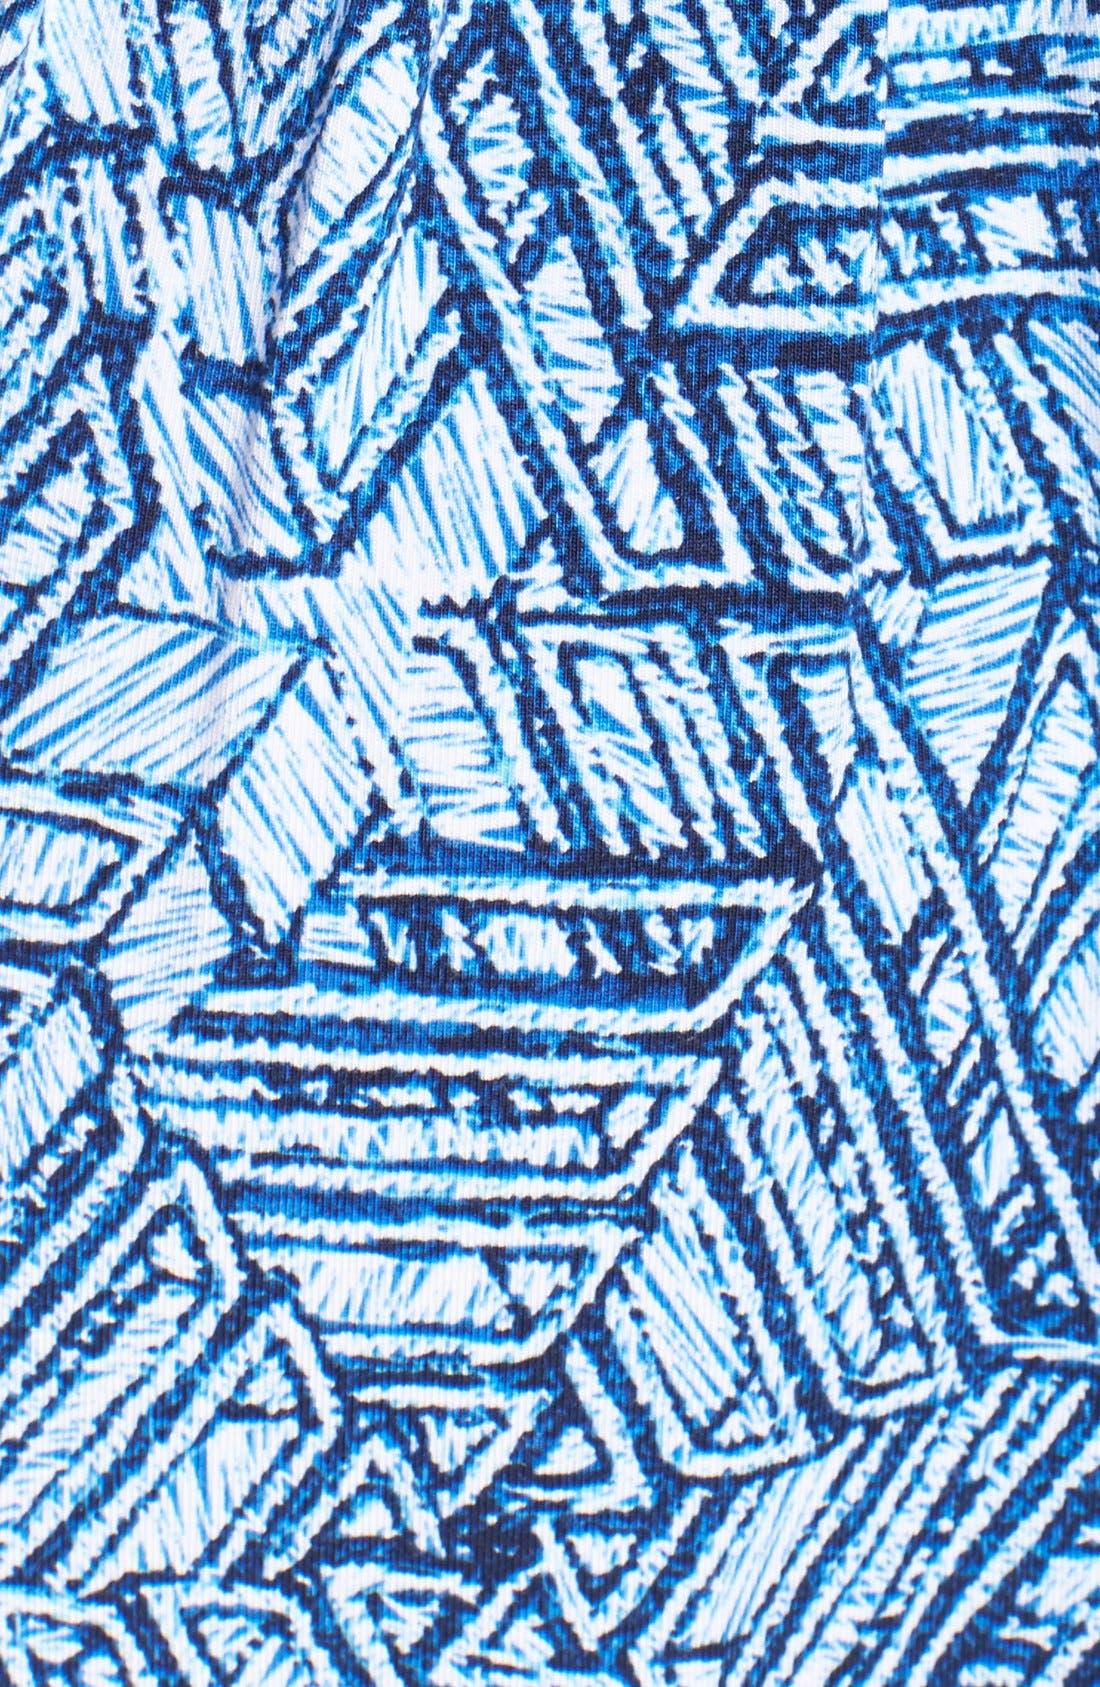 Chloe Empire Waist Maxi Dress,                             Alternate thumbnail 52, color,